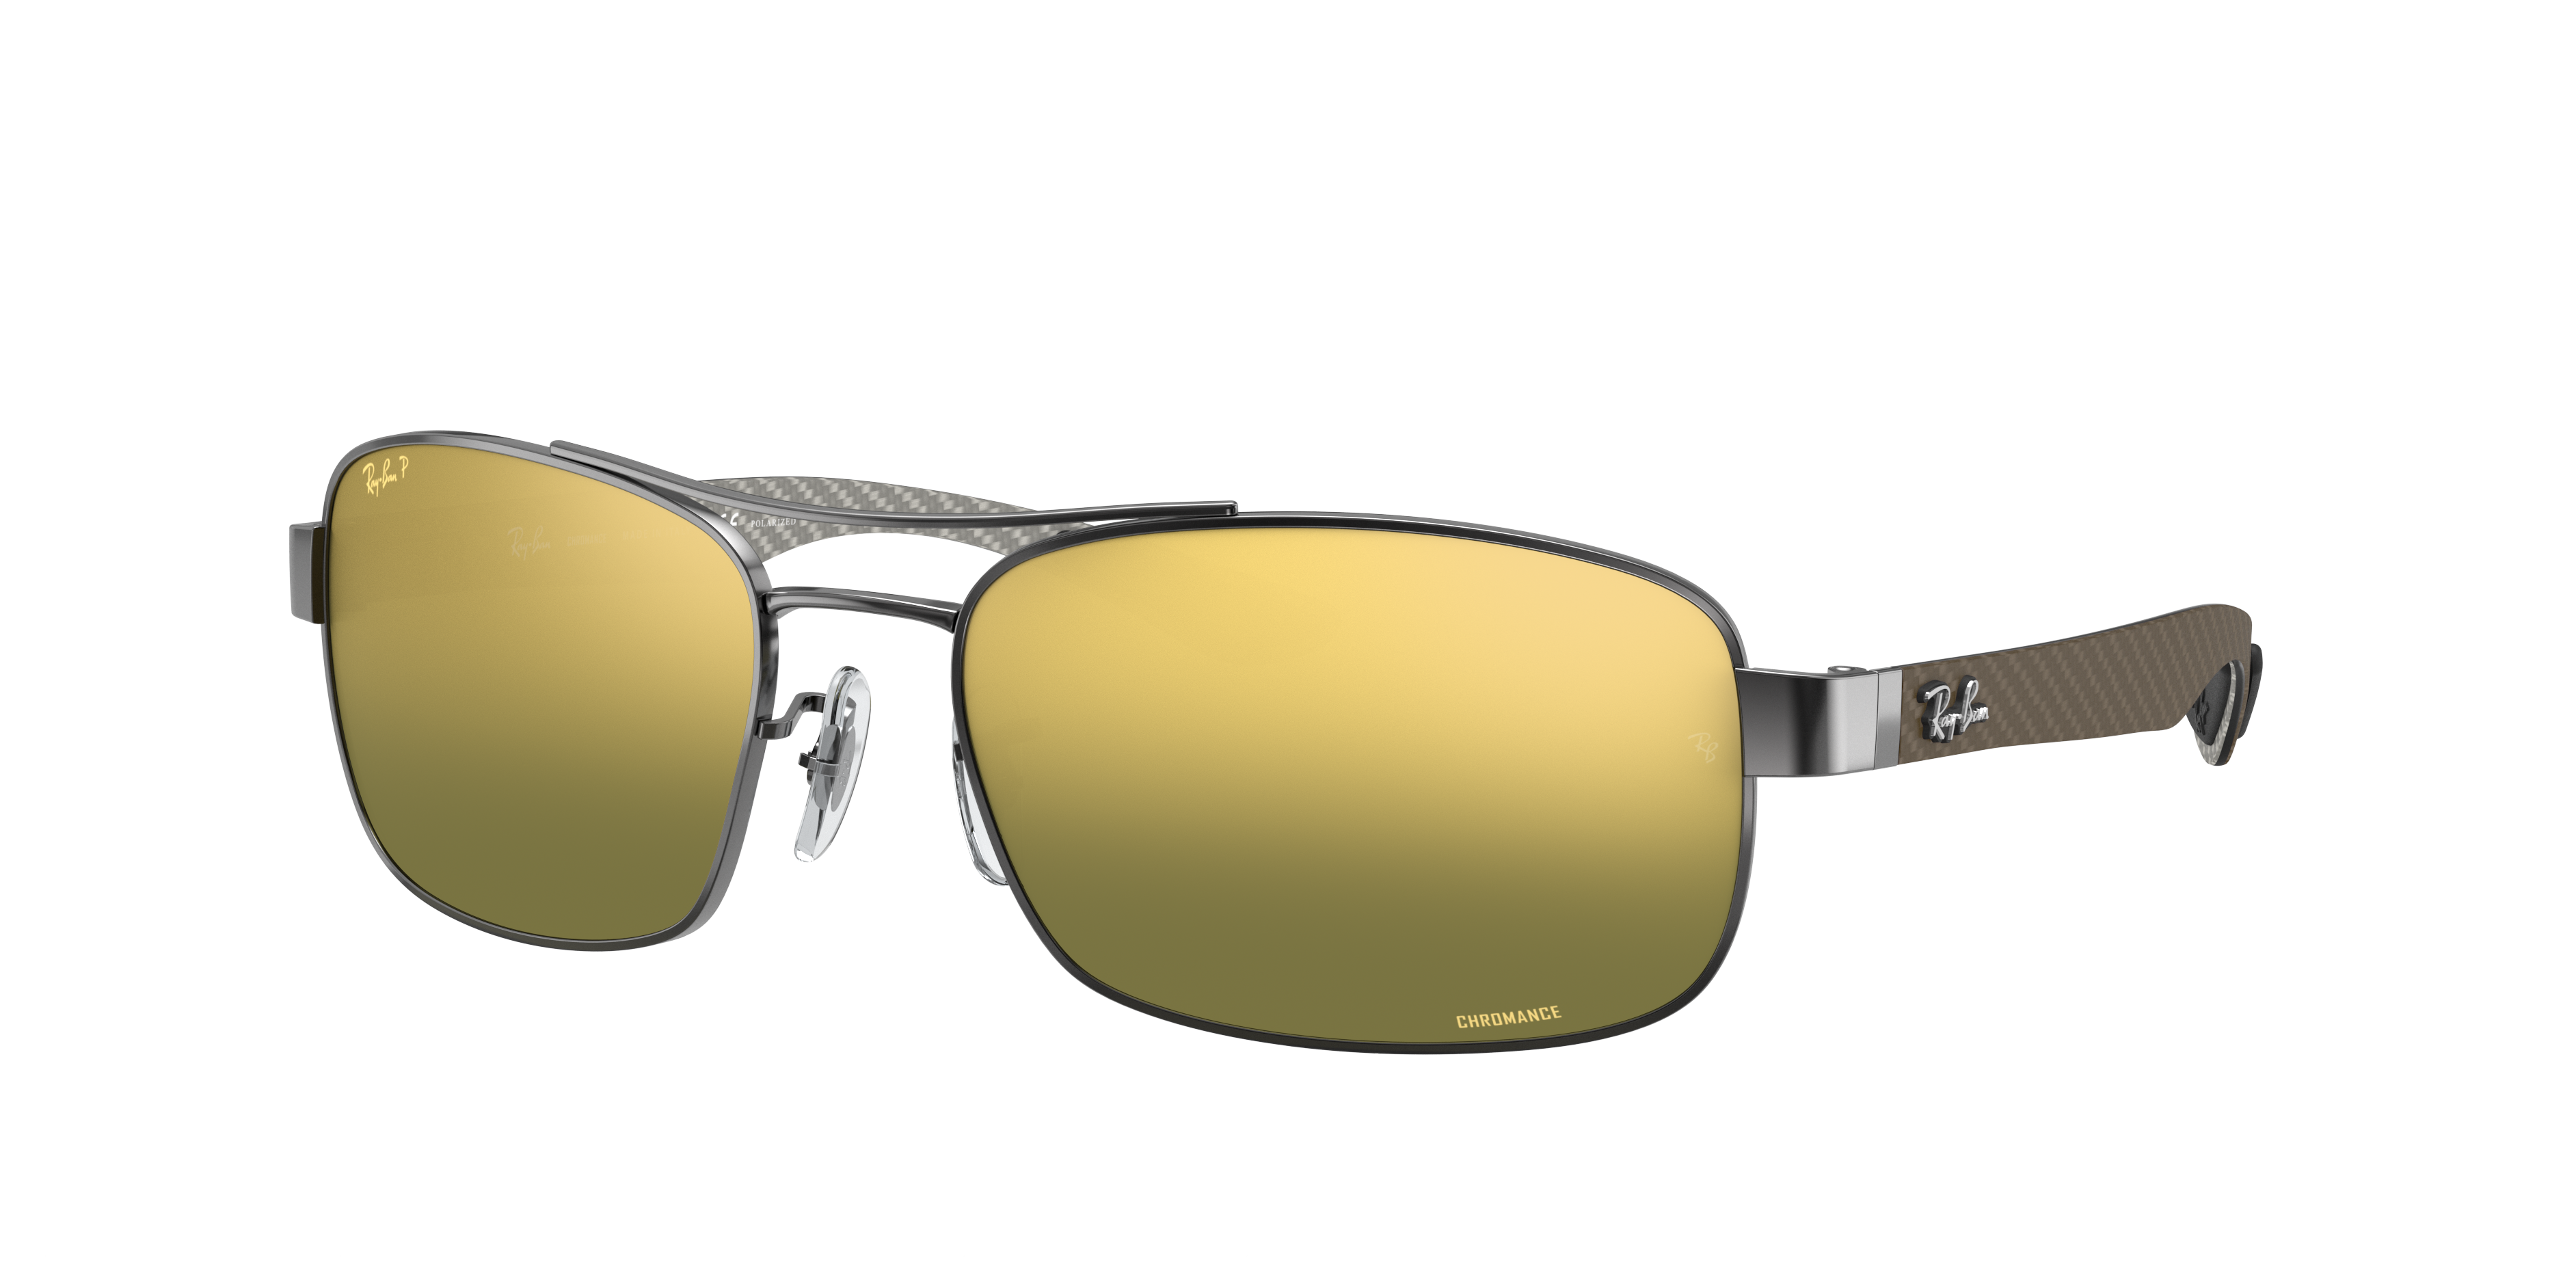 Ray-Ban Rb8318 Chromance Gunmetal, Polarized Green Lenses - RB8318CH